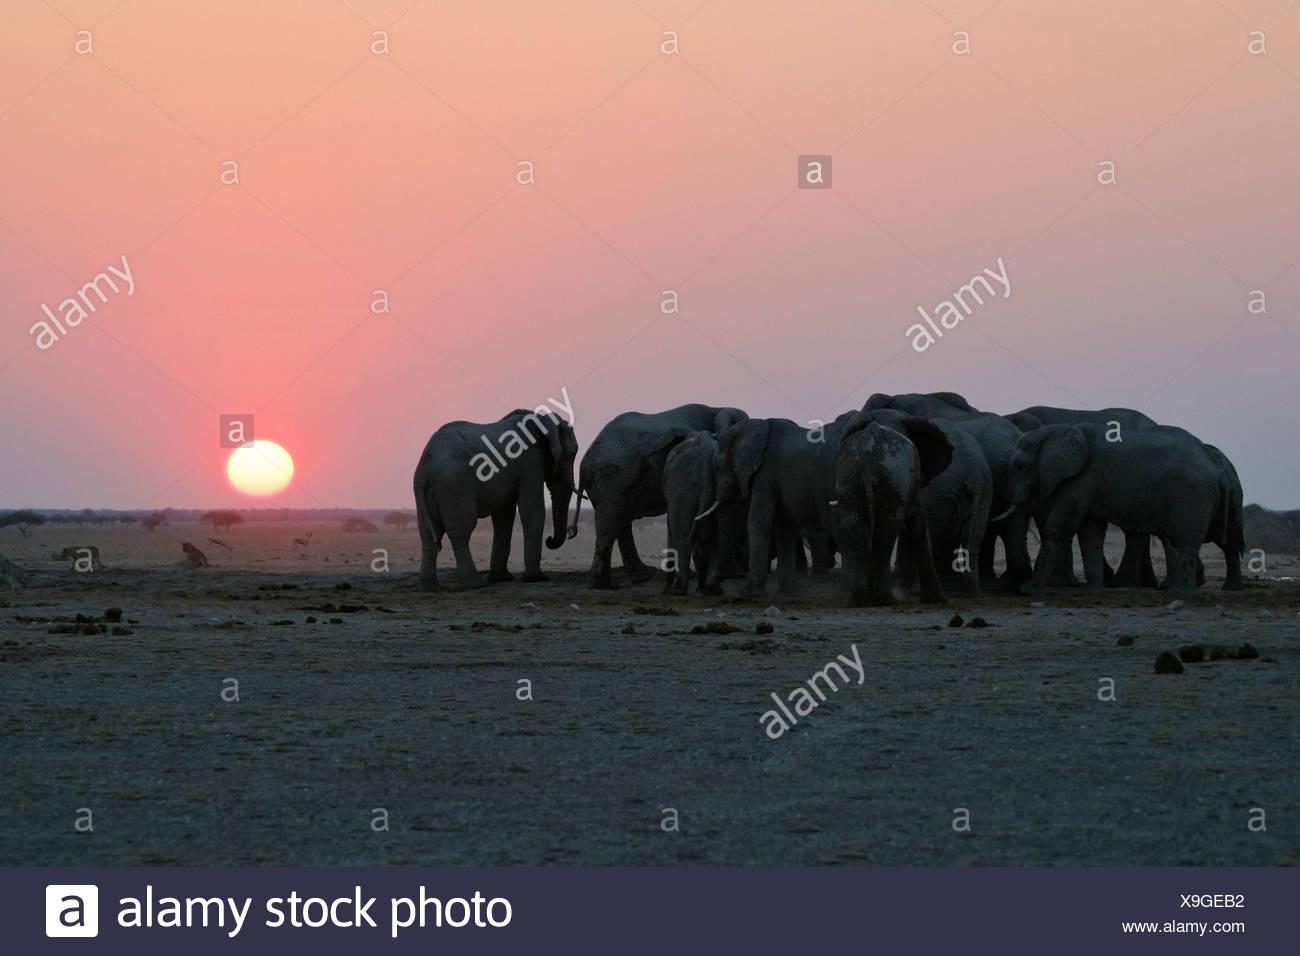 African Elephants (Loxodonta africana) at sunset, Nxai Pan waterhole, Makgadikgadi Pans National Park, Botswana, Africa Stock Photo